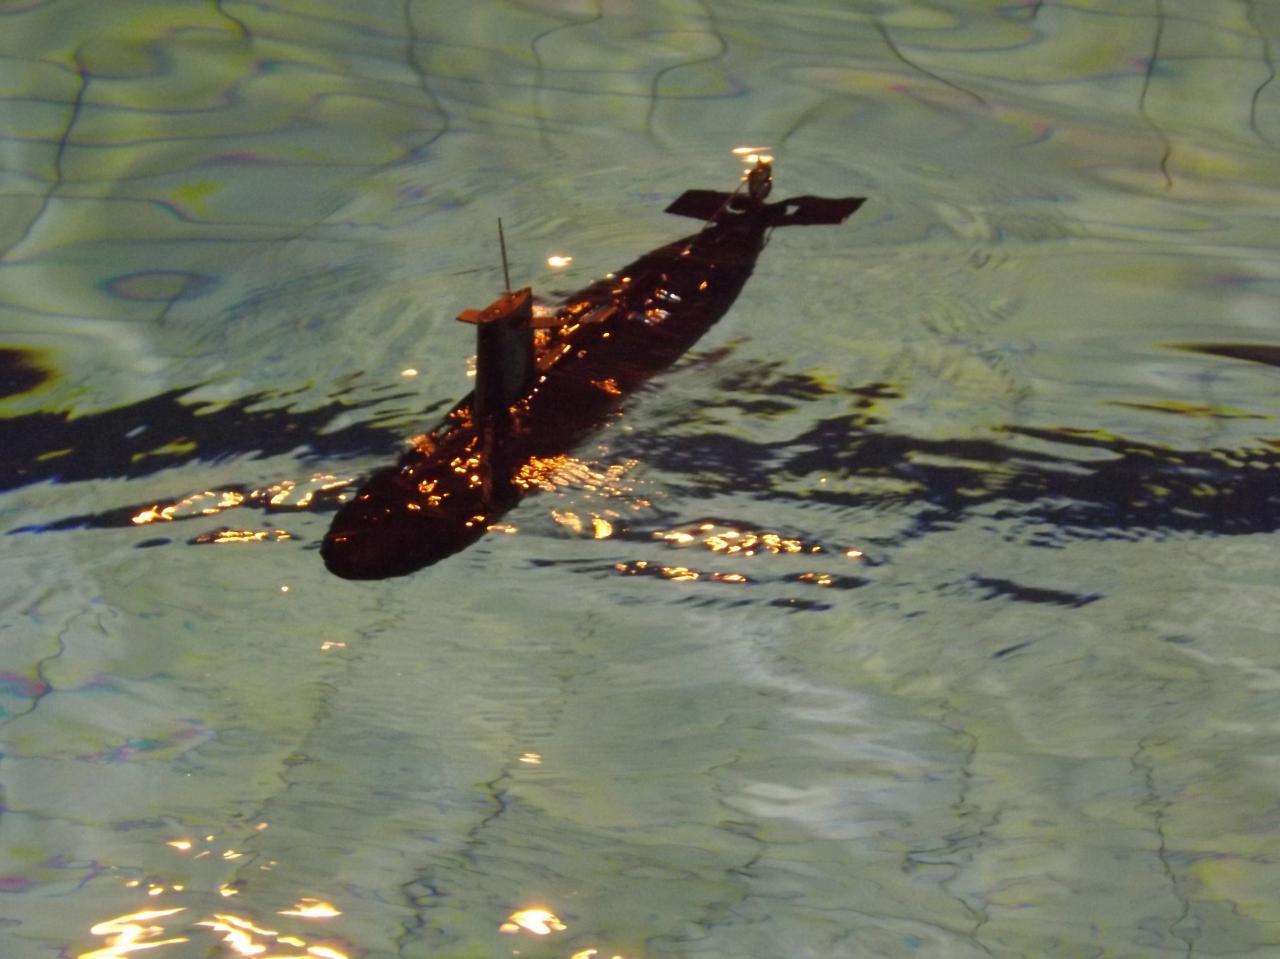 Le Seawolf en route pour sa première plongée